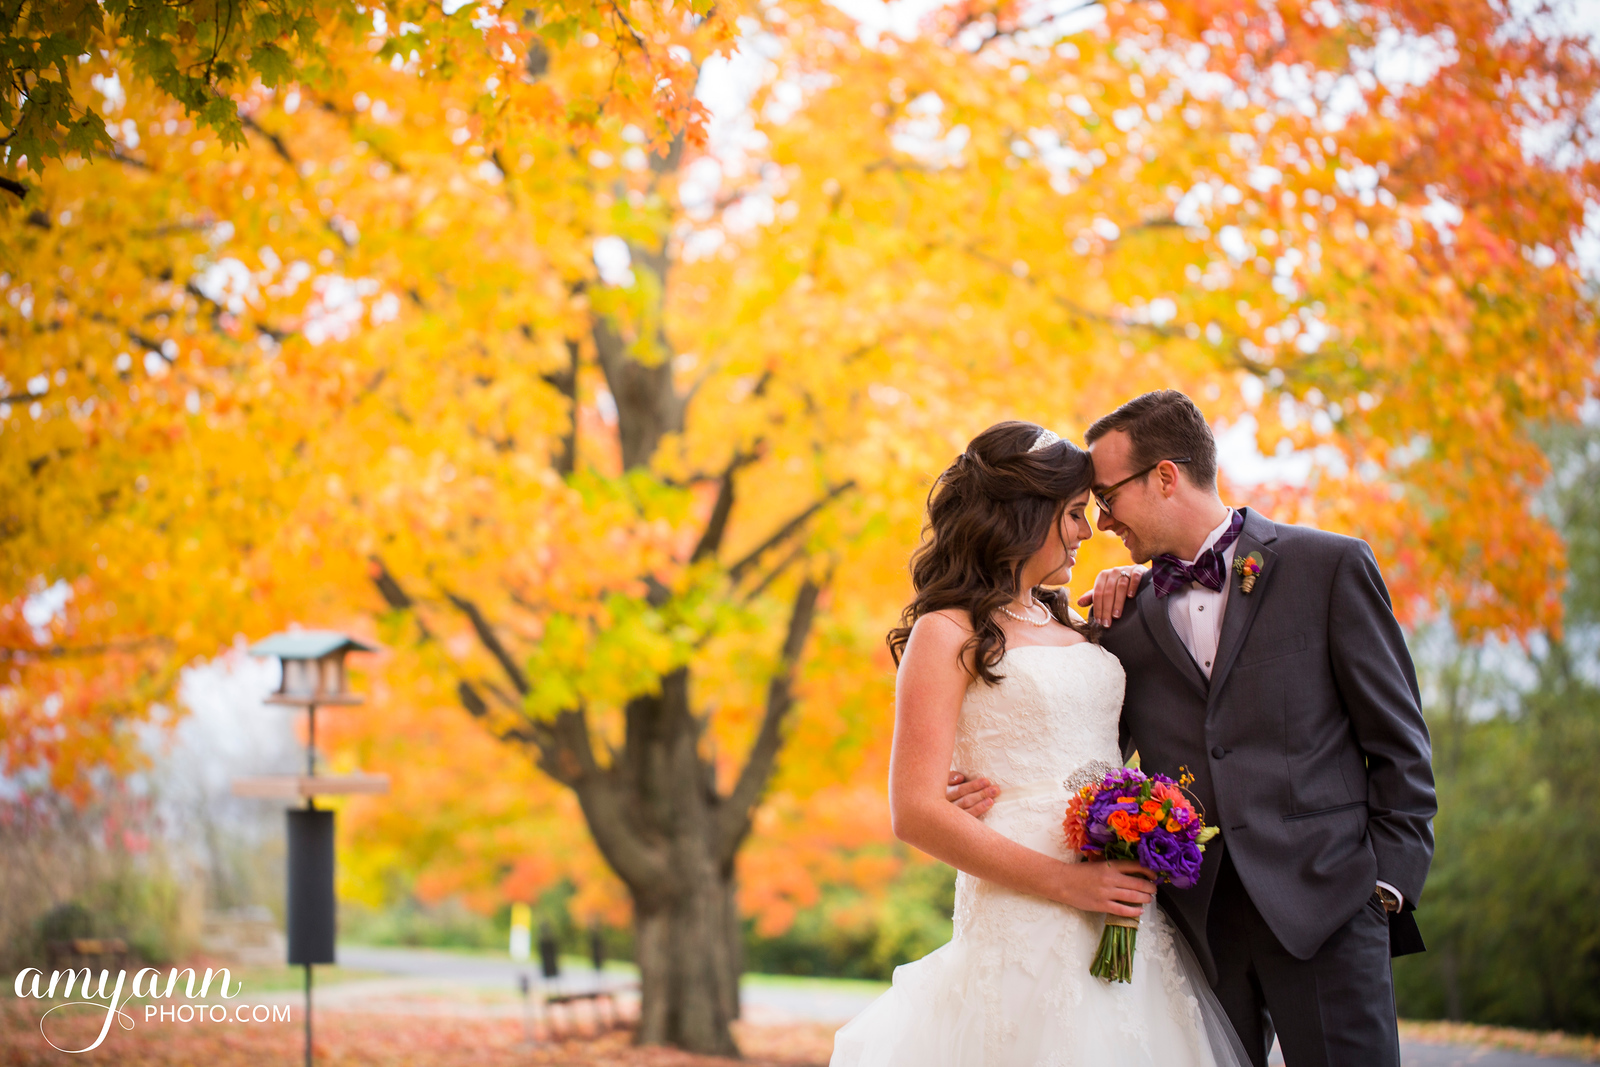 melissaanthony_weddingblog064